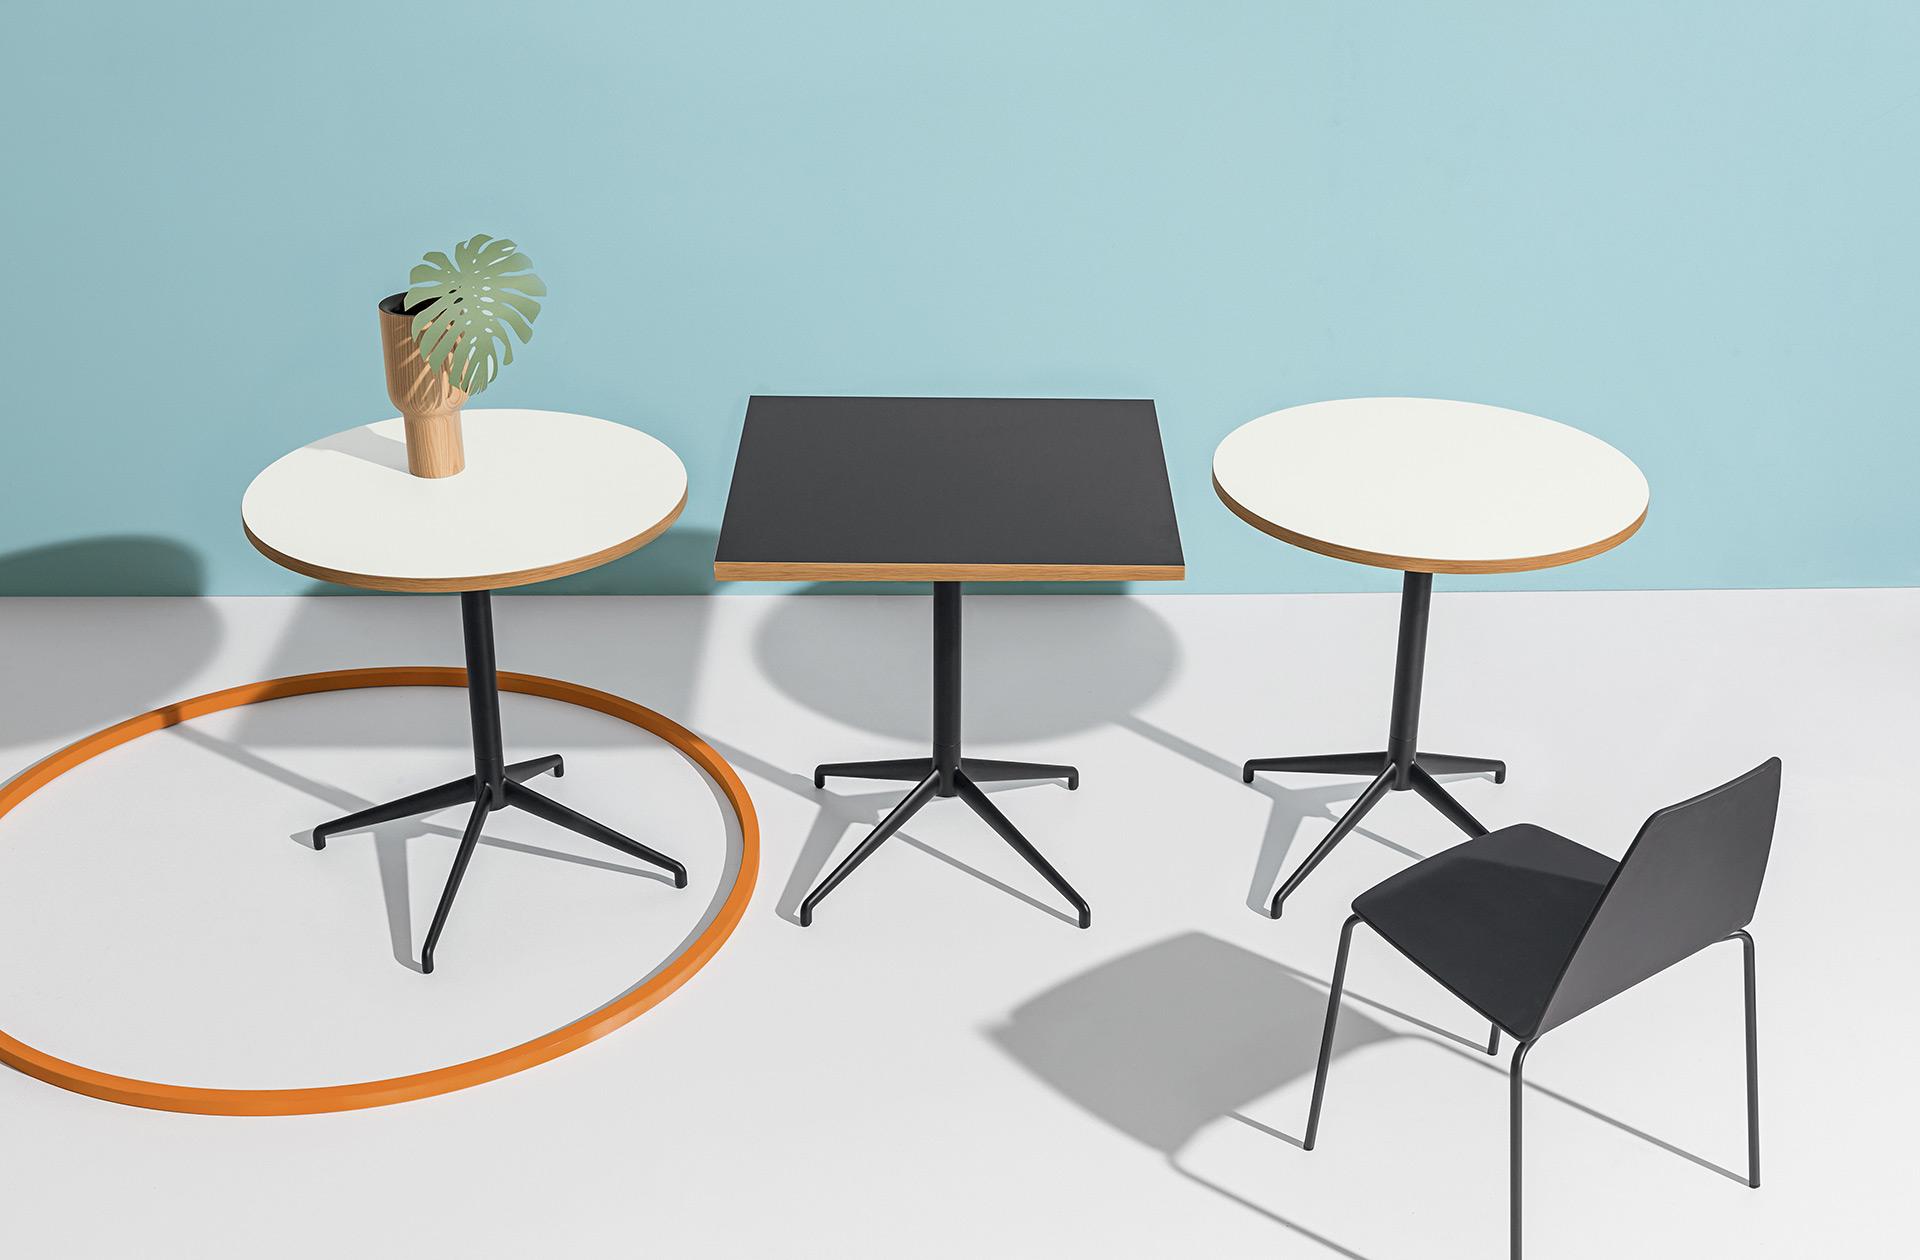 Alis - tavoli, tavoli da cucina, tavoli in legno, tavolo rotondo